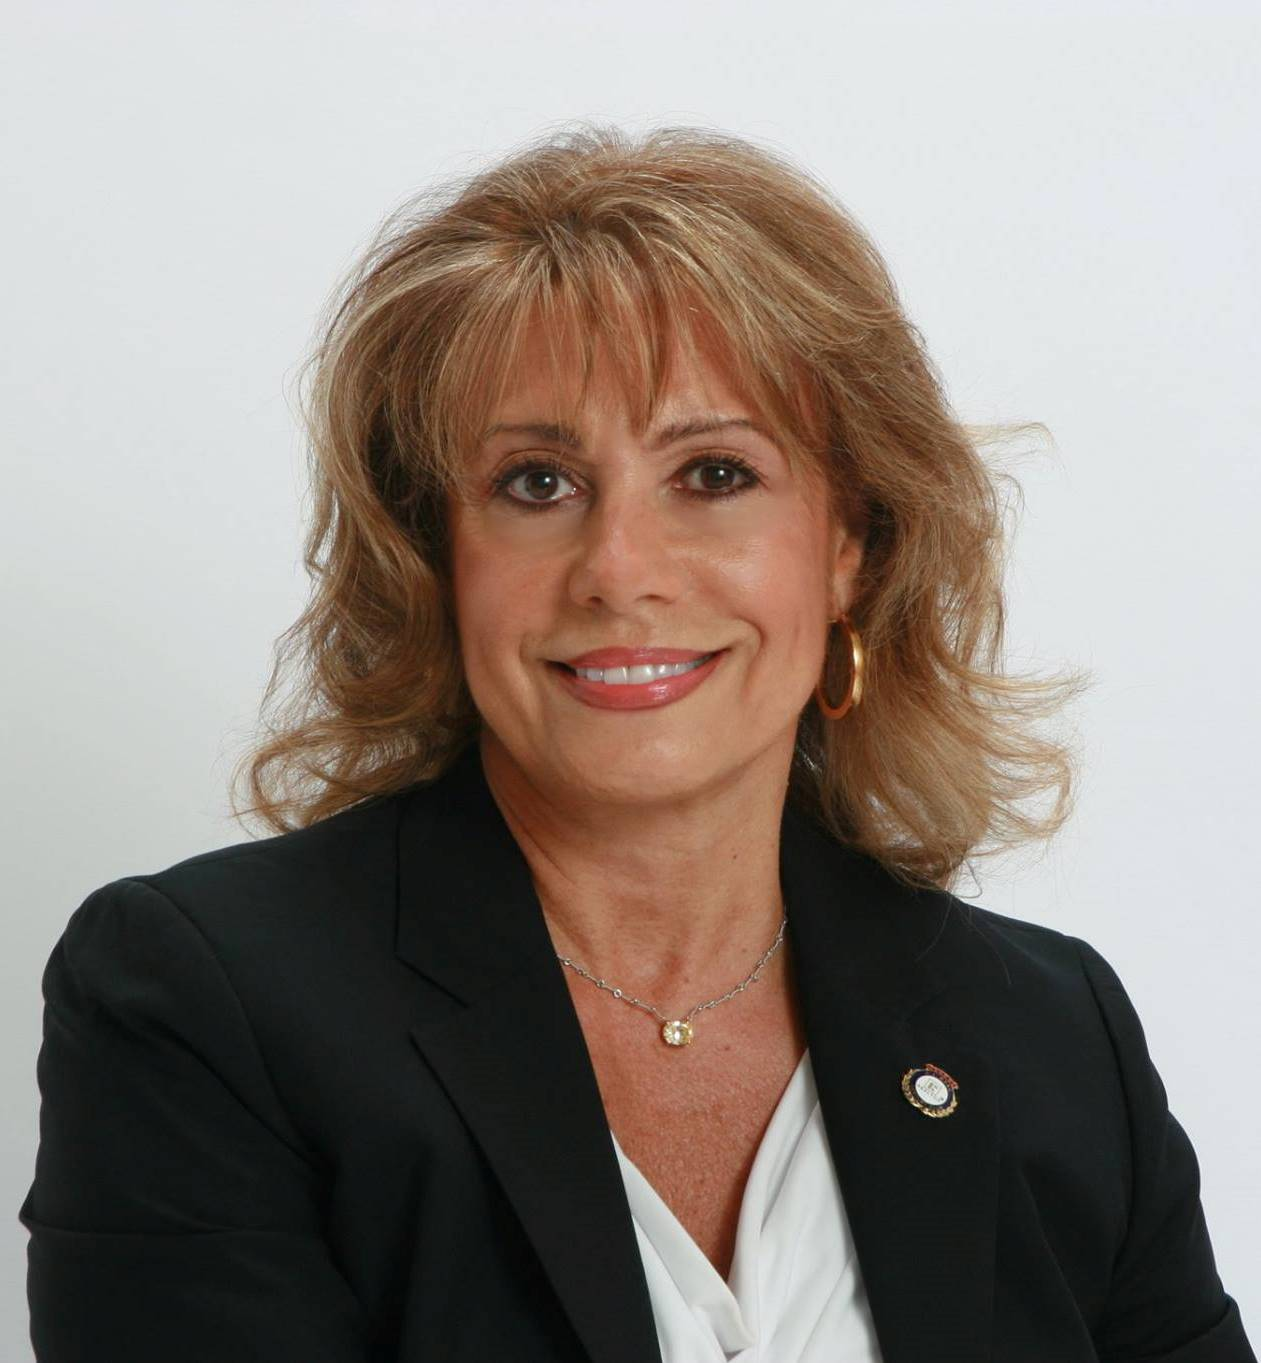 Evelyn Paladino